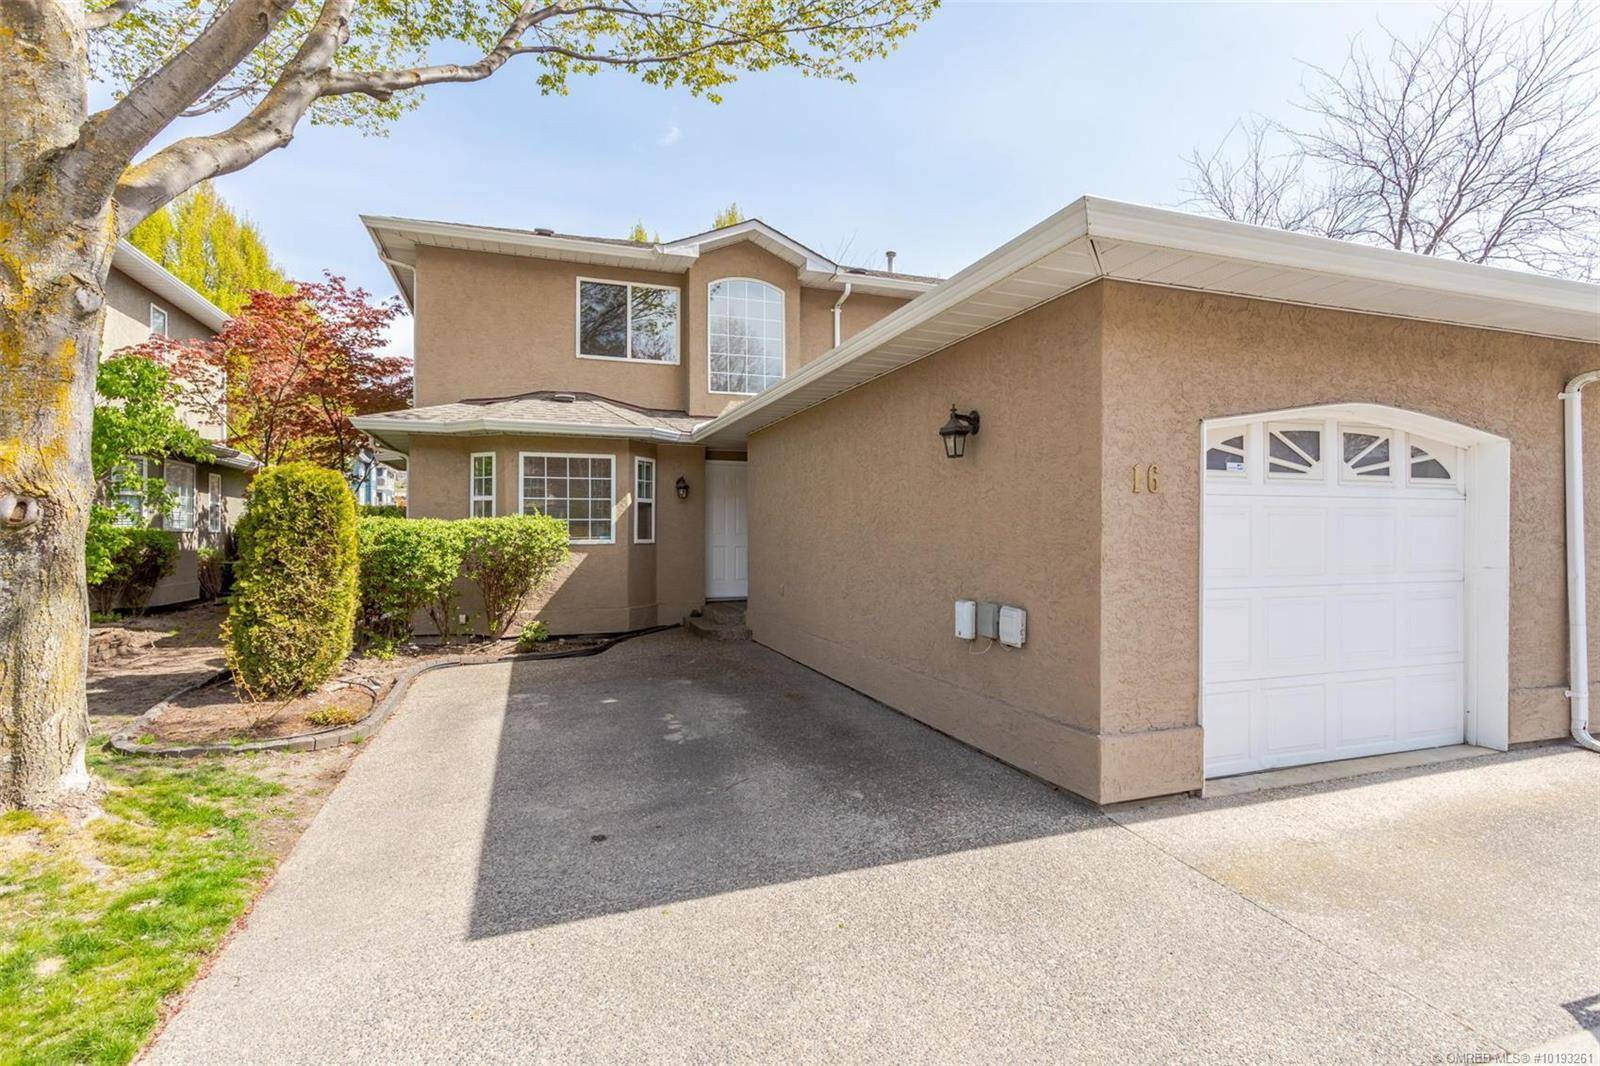 Townhouse for sale at 545 Glenmeadows Rd Unit 16 Kelowna British Columbia - MLS: 10193261